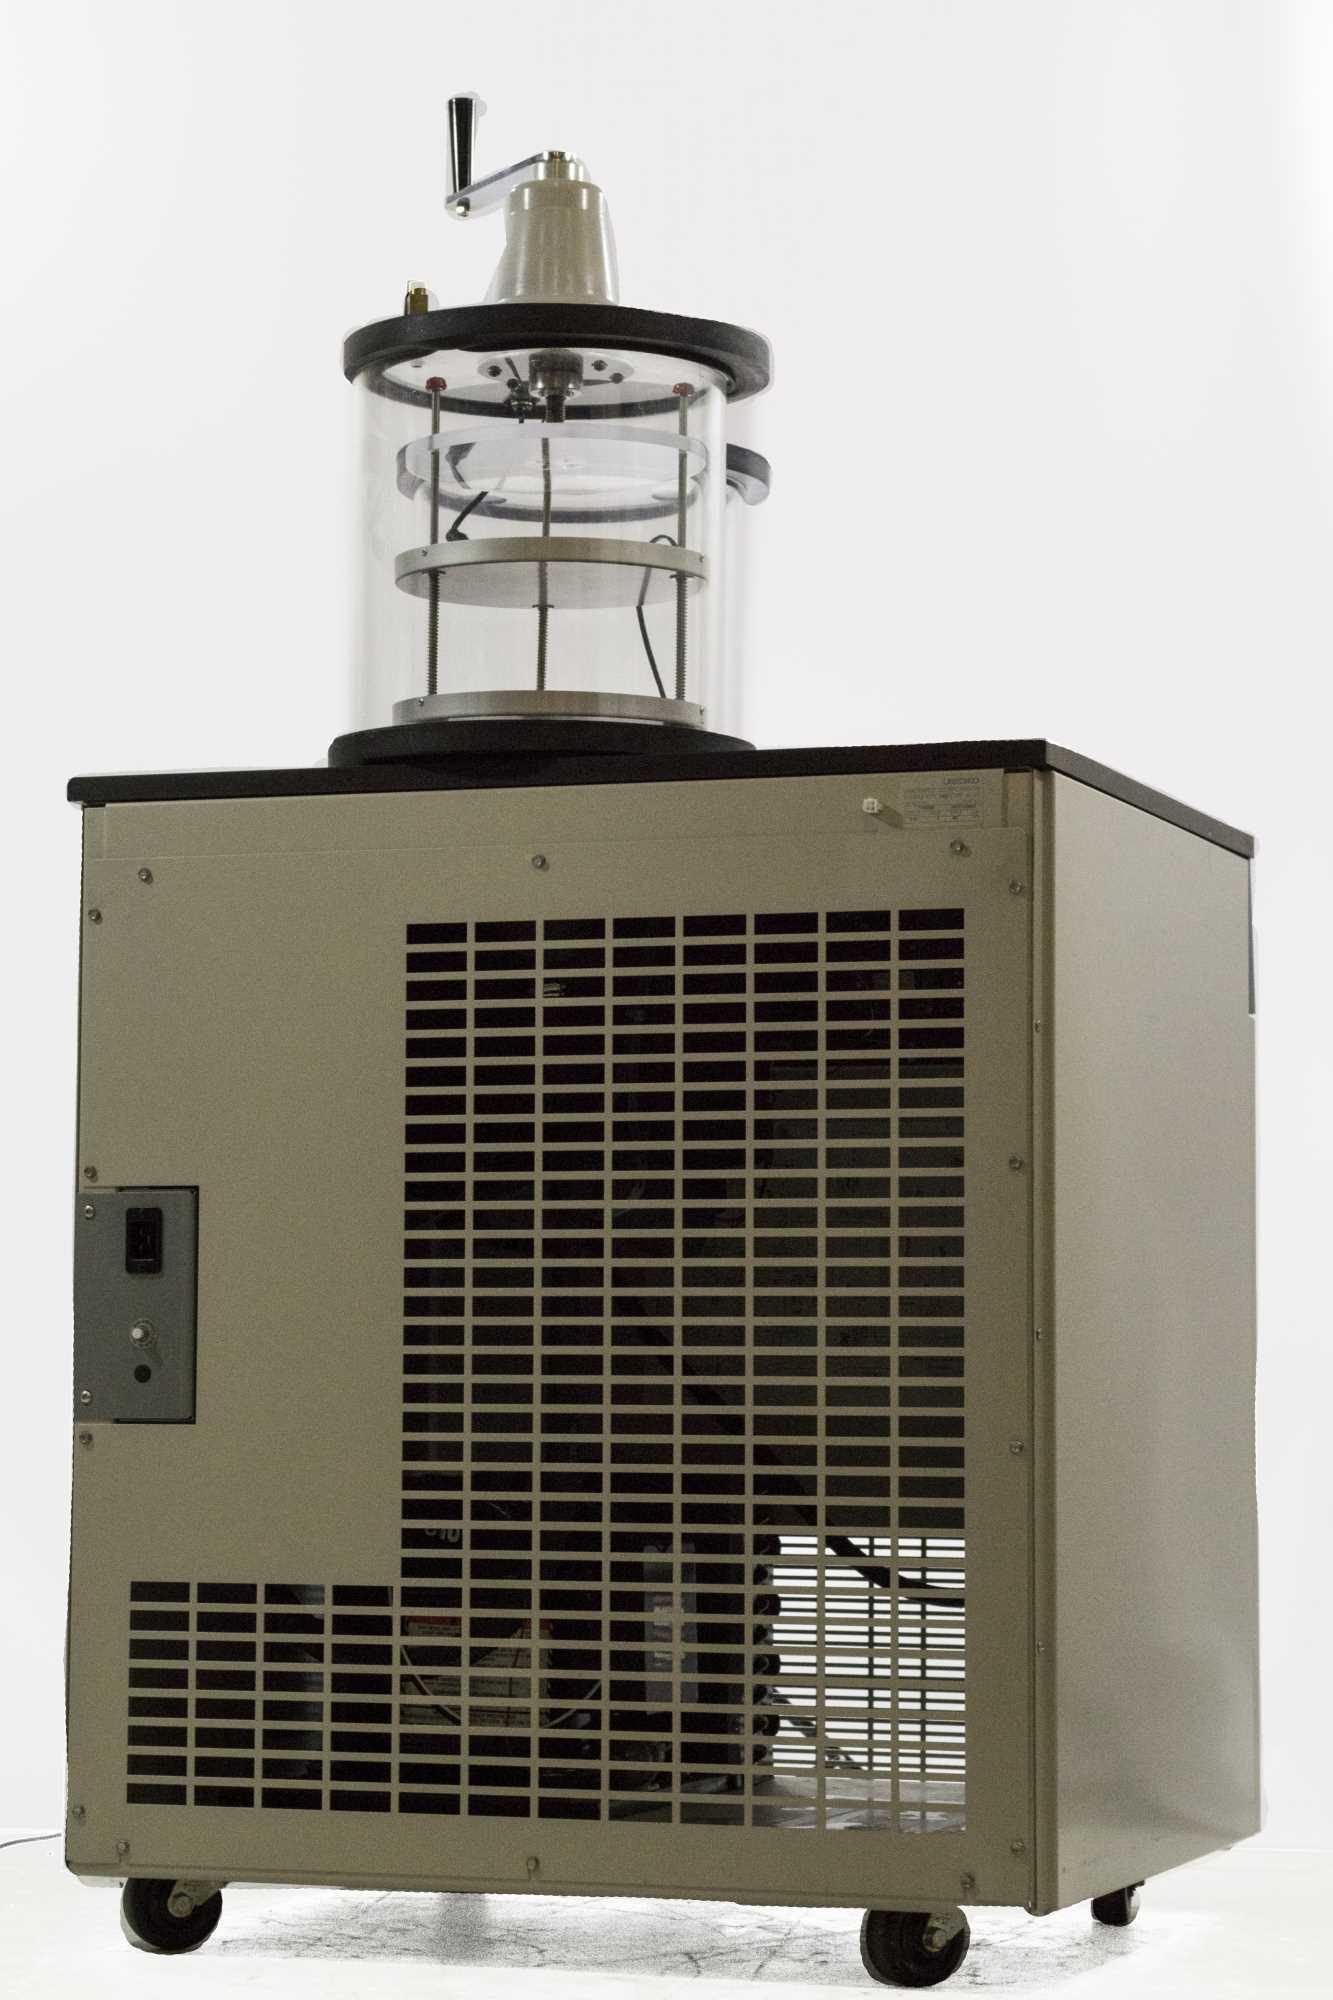 Labconco Freezone 6 Freeze Dry System 77530-00